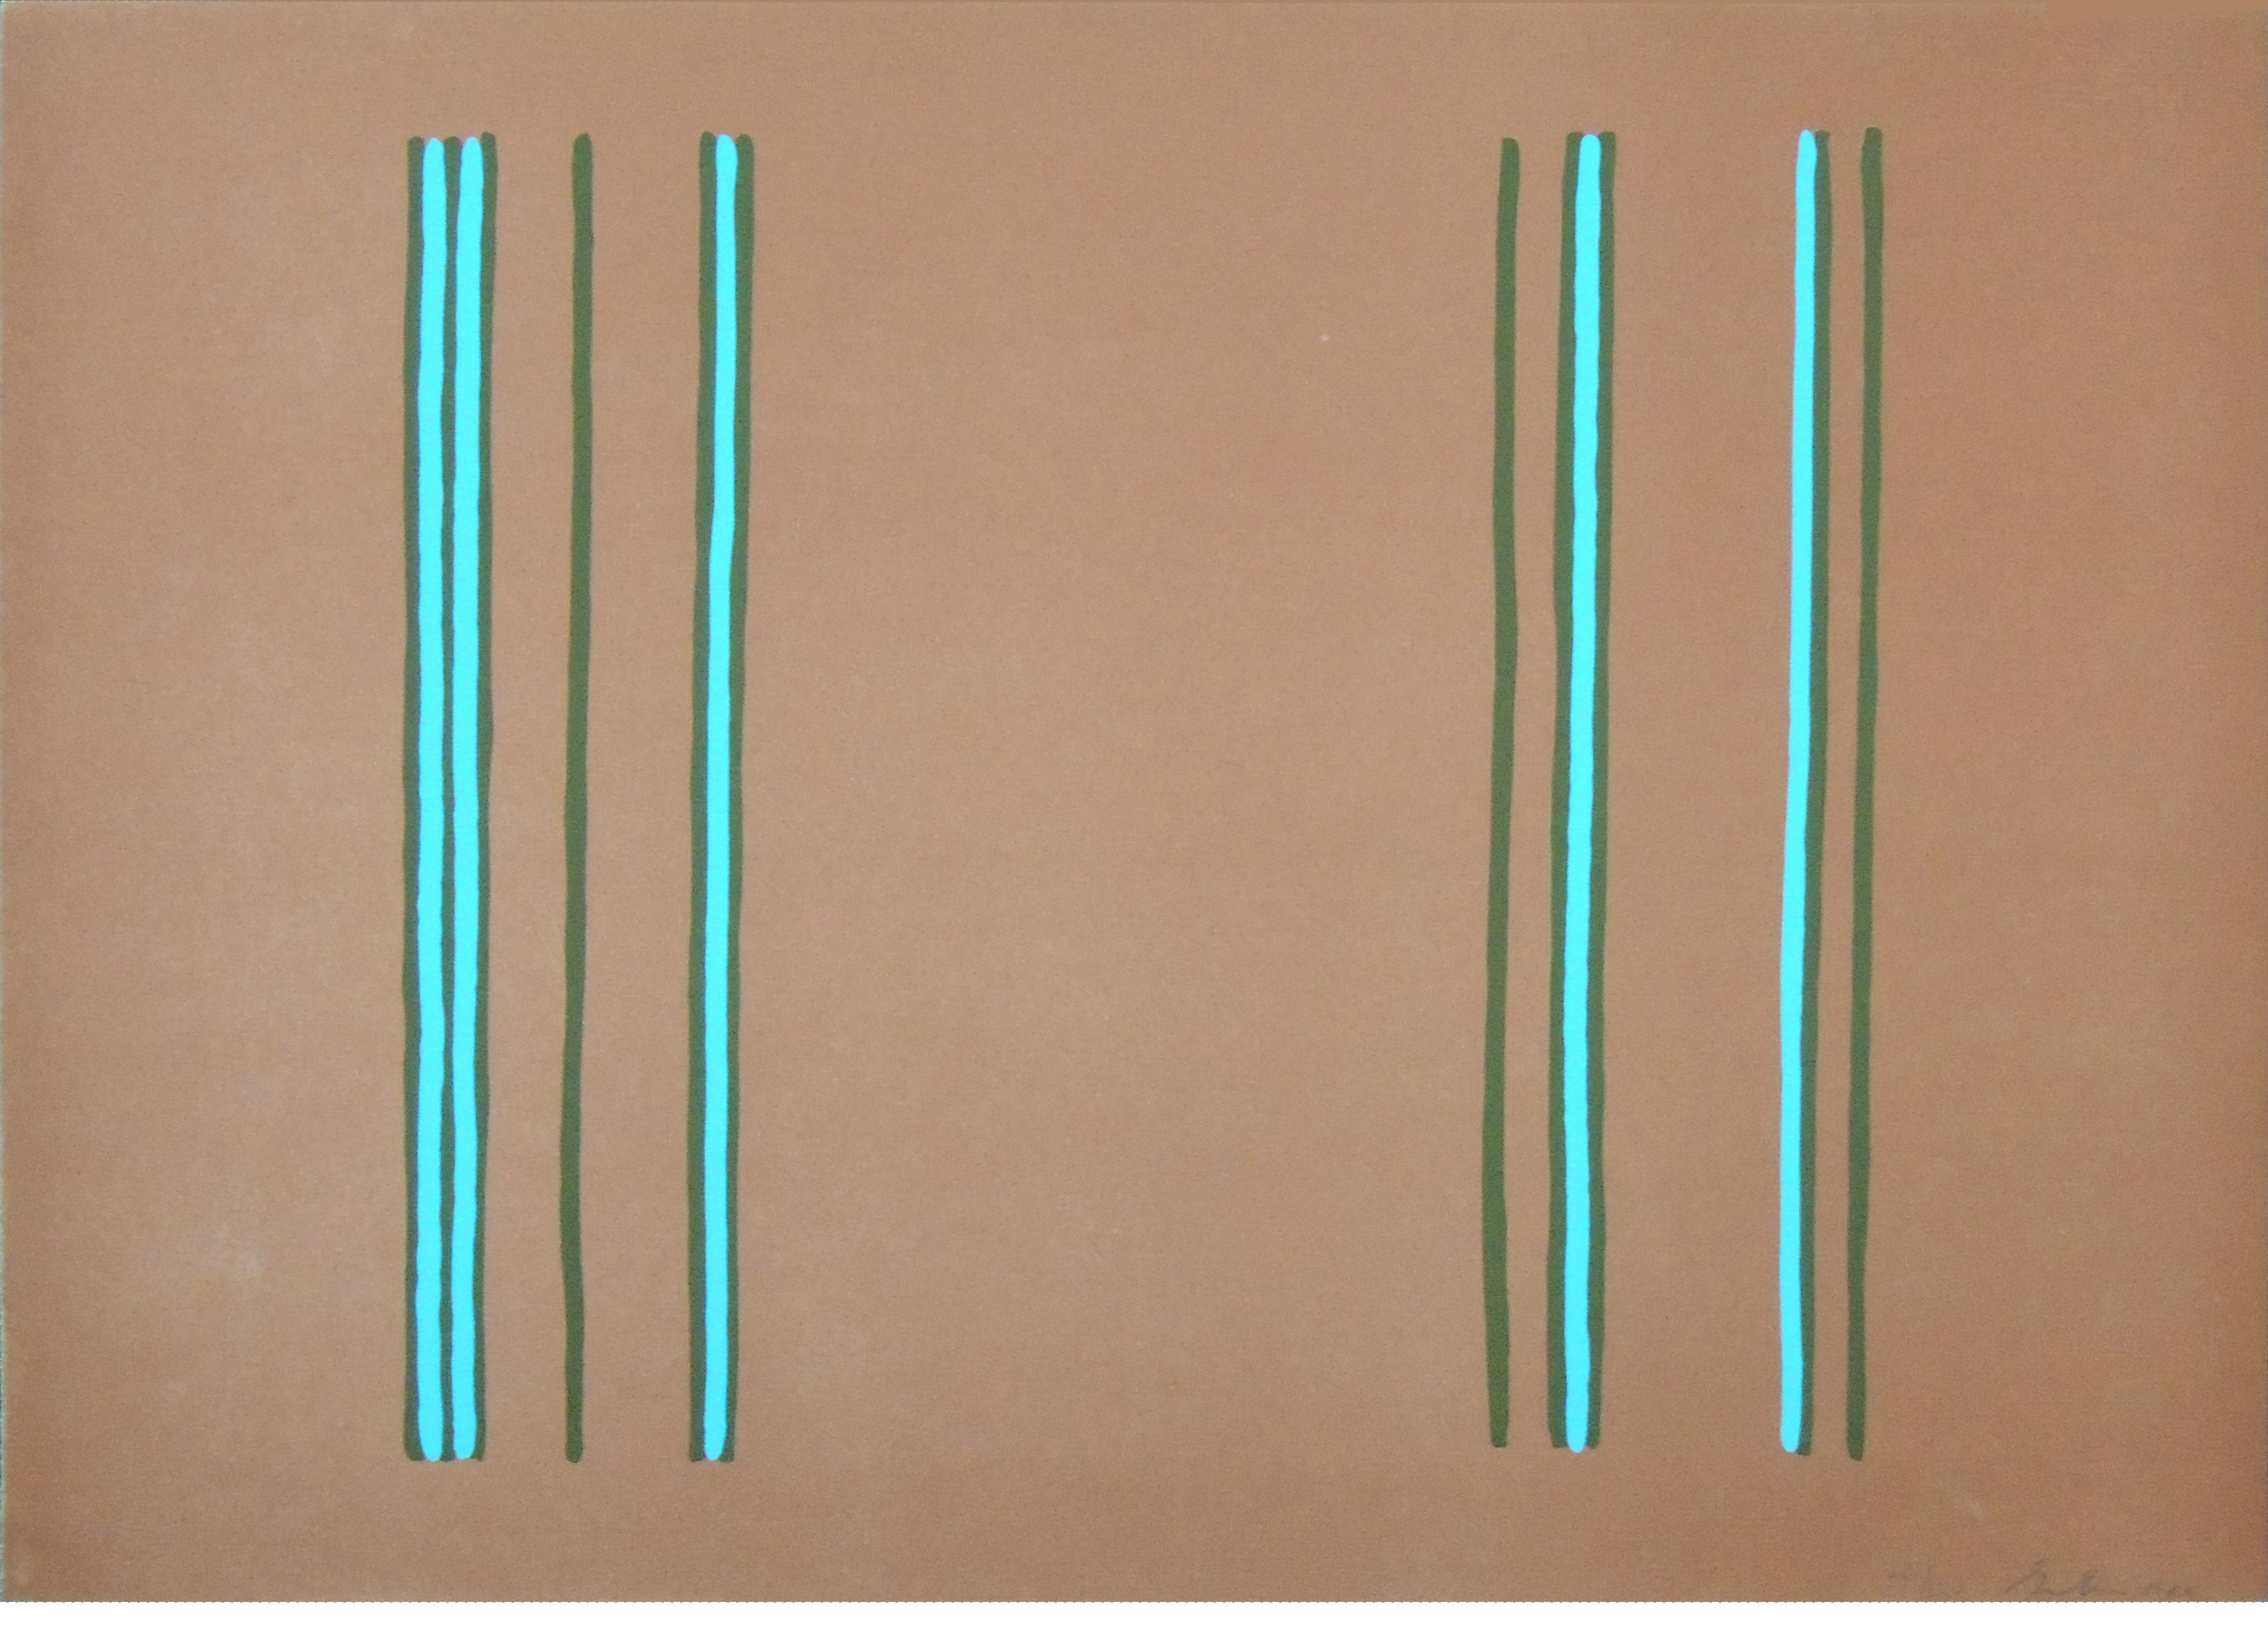 "1996.035 | Gene Davis | LILAC | lithograph on paper |22 x 30"" | 1980 | Gift of Adam E. Schuster"